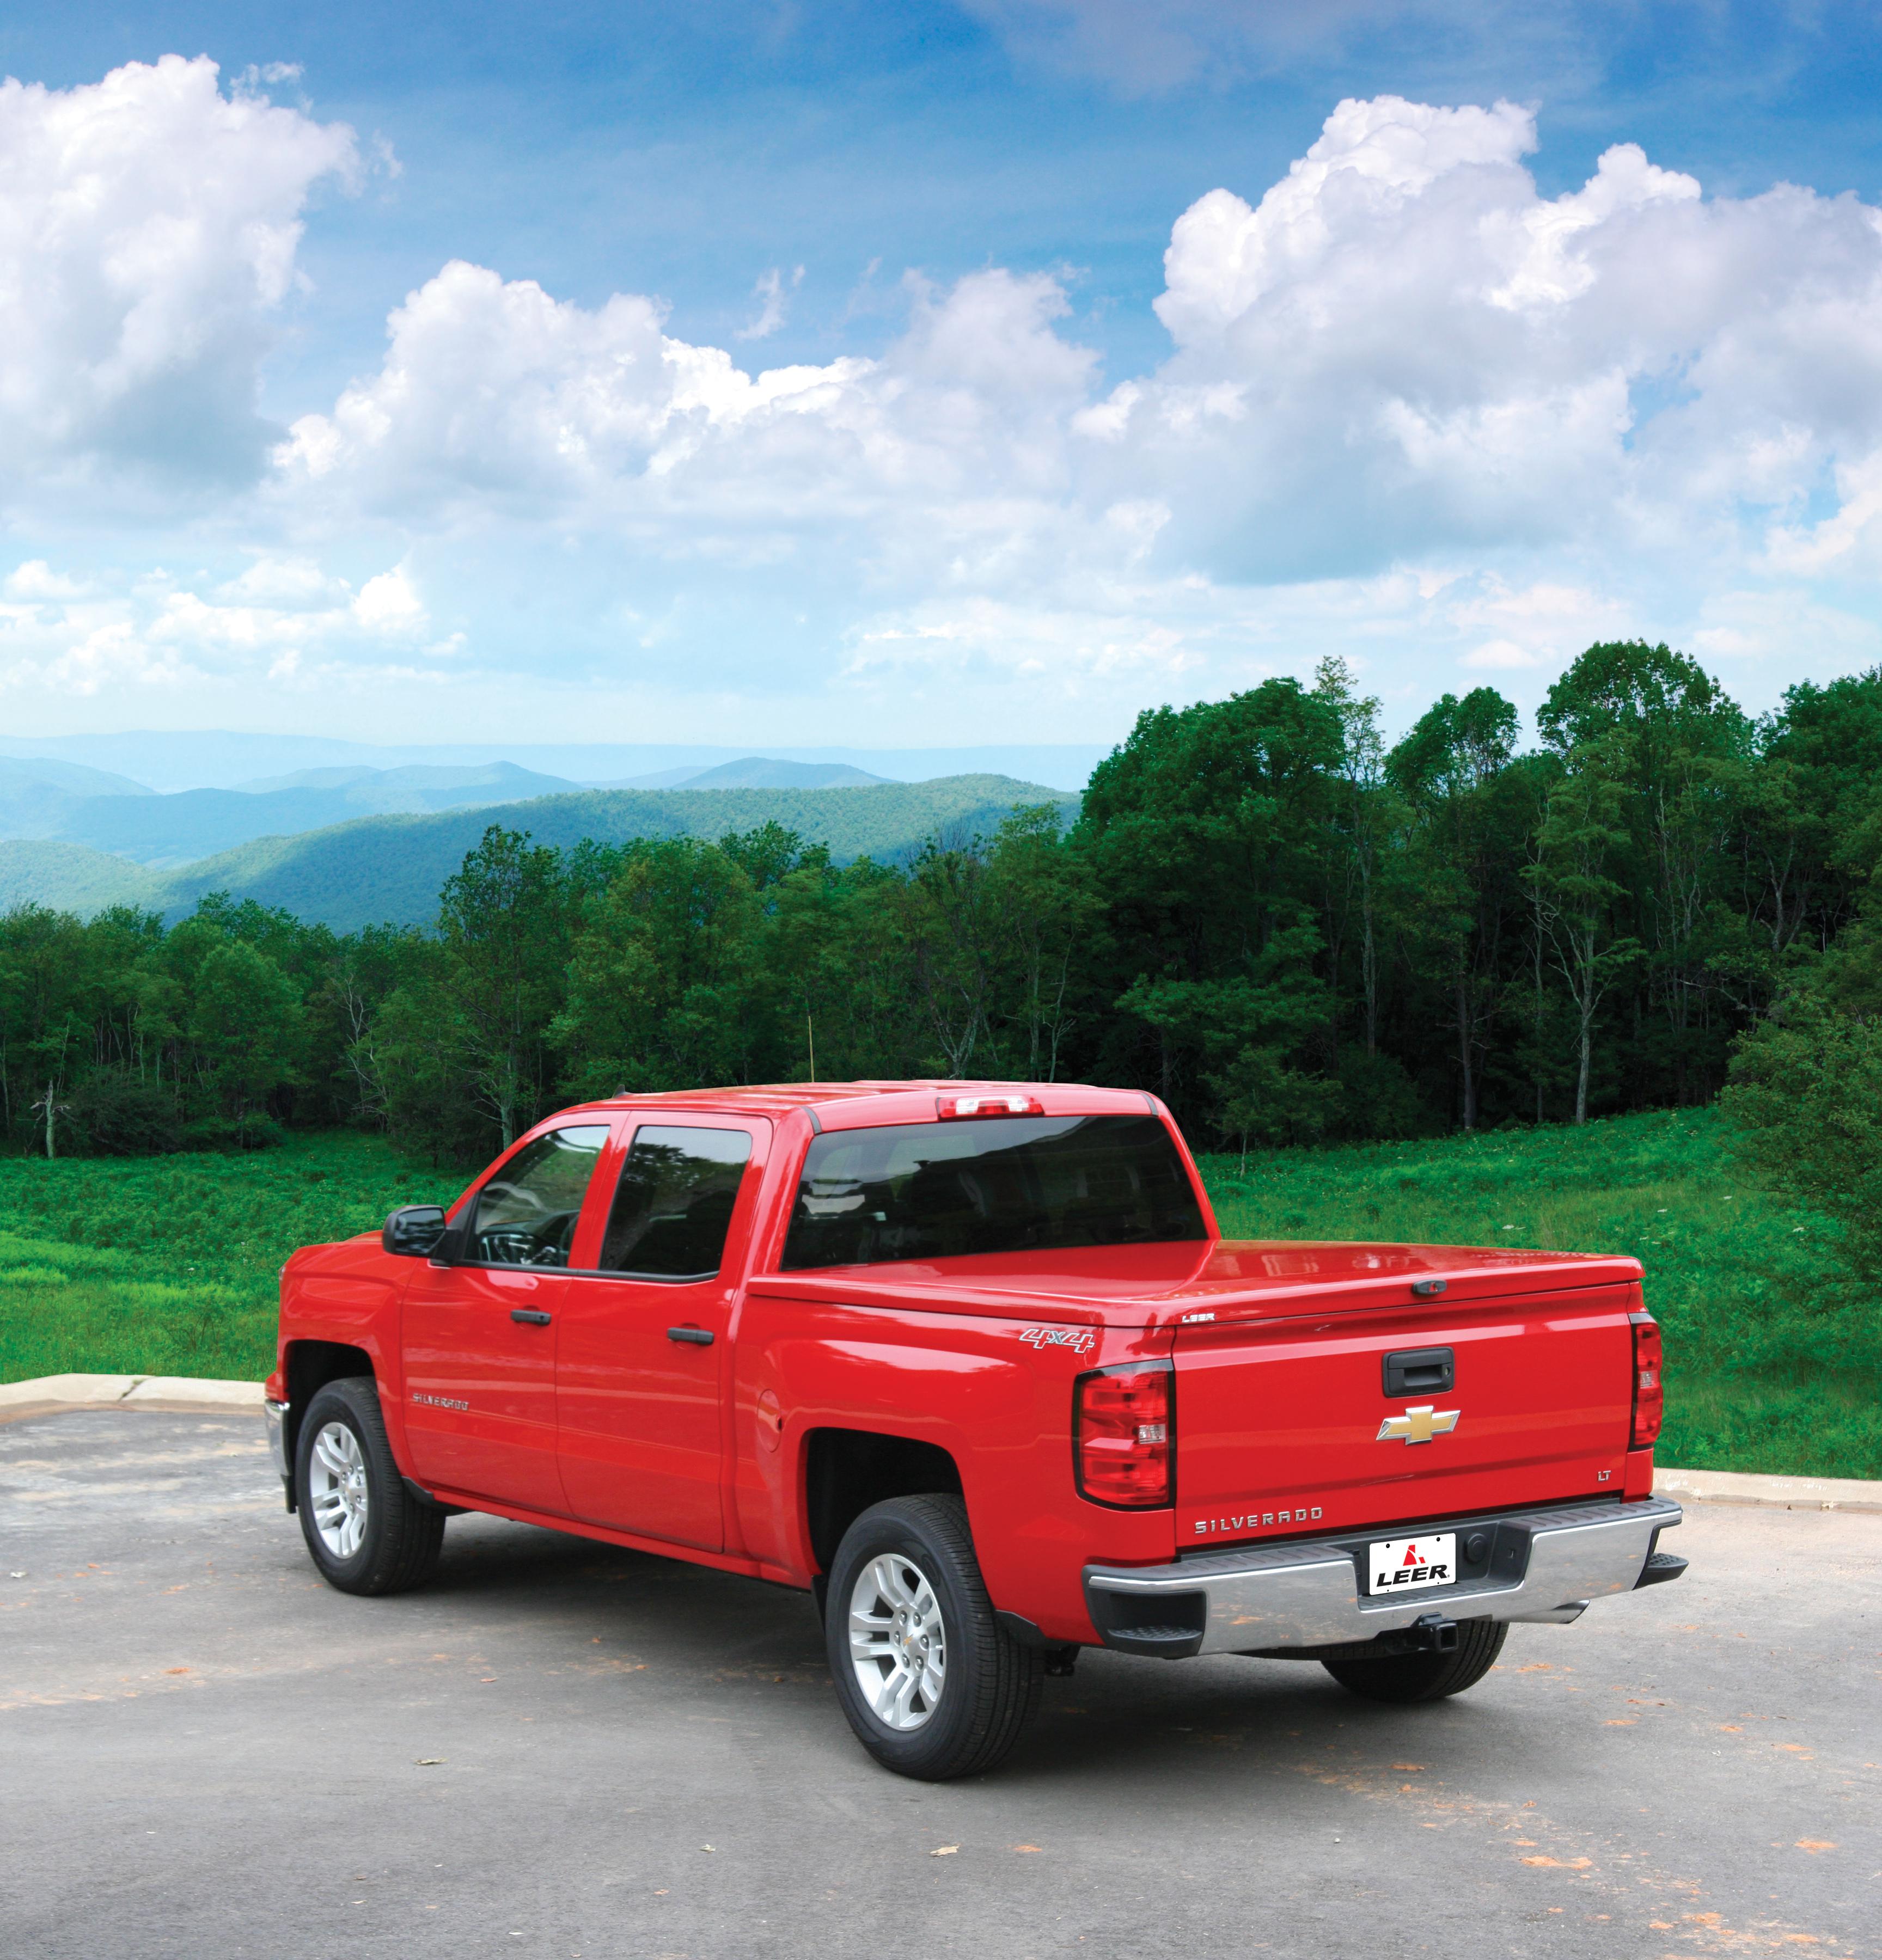 Chevrolet Camper Shell: 2017 Chevrolet Camper Shells Truck Toppers Truck Caps